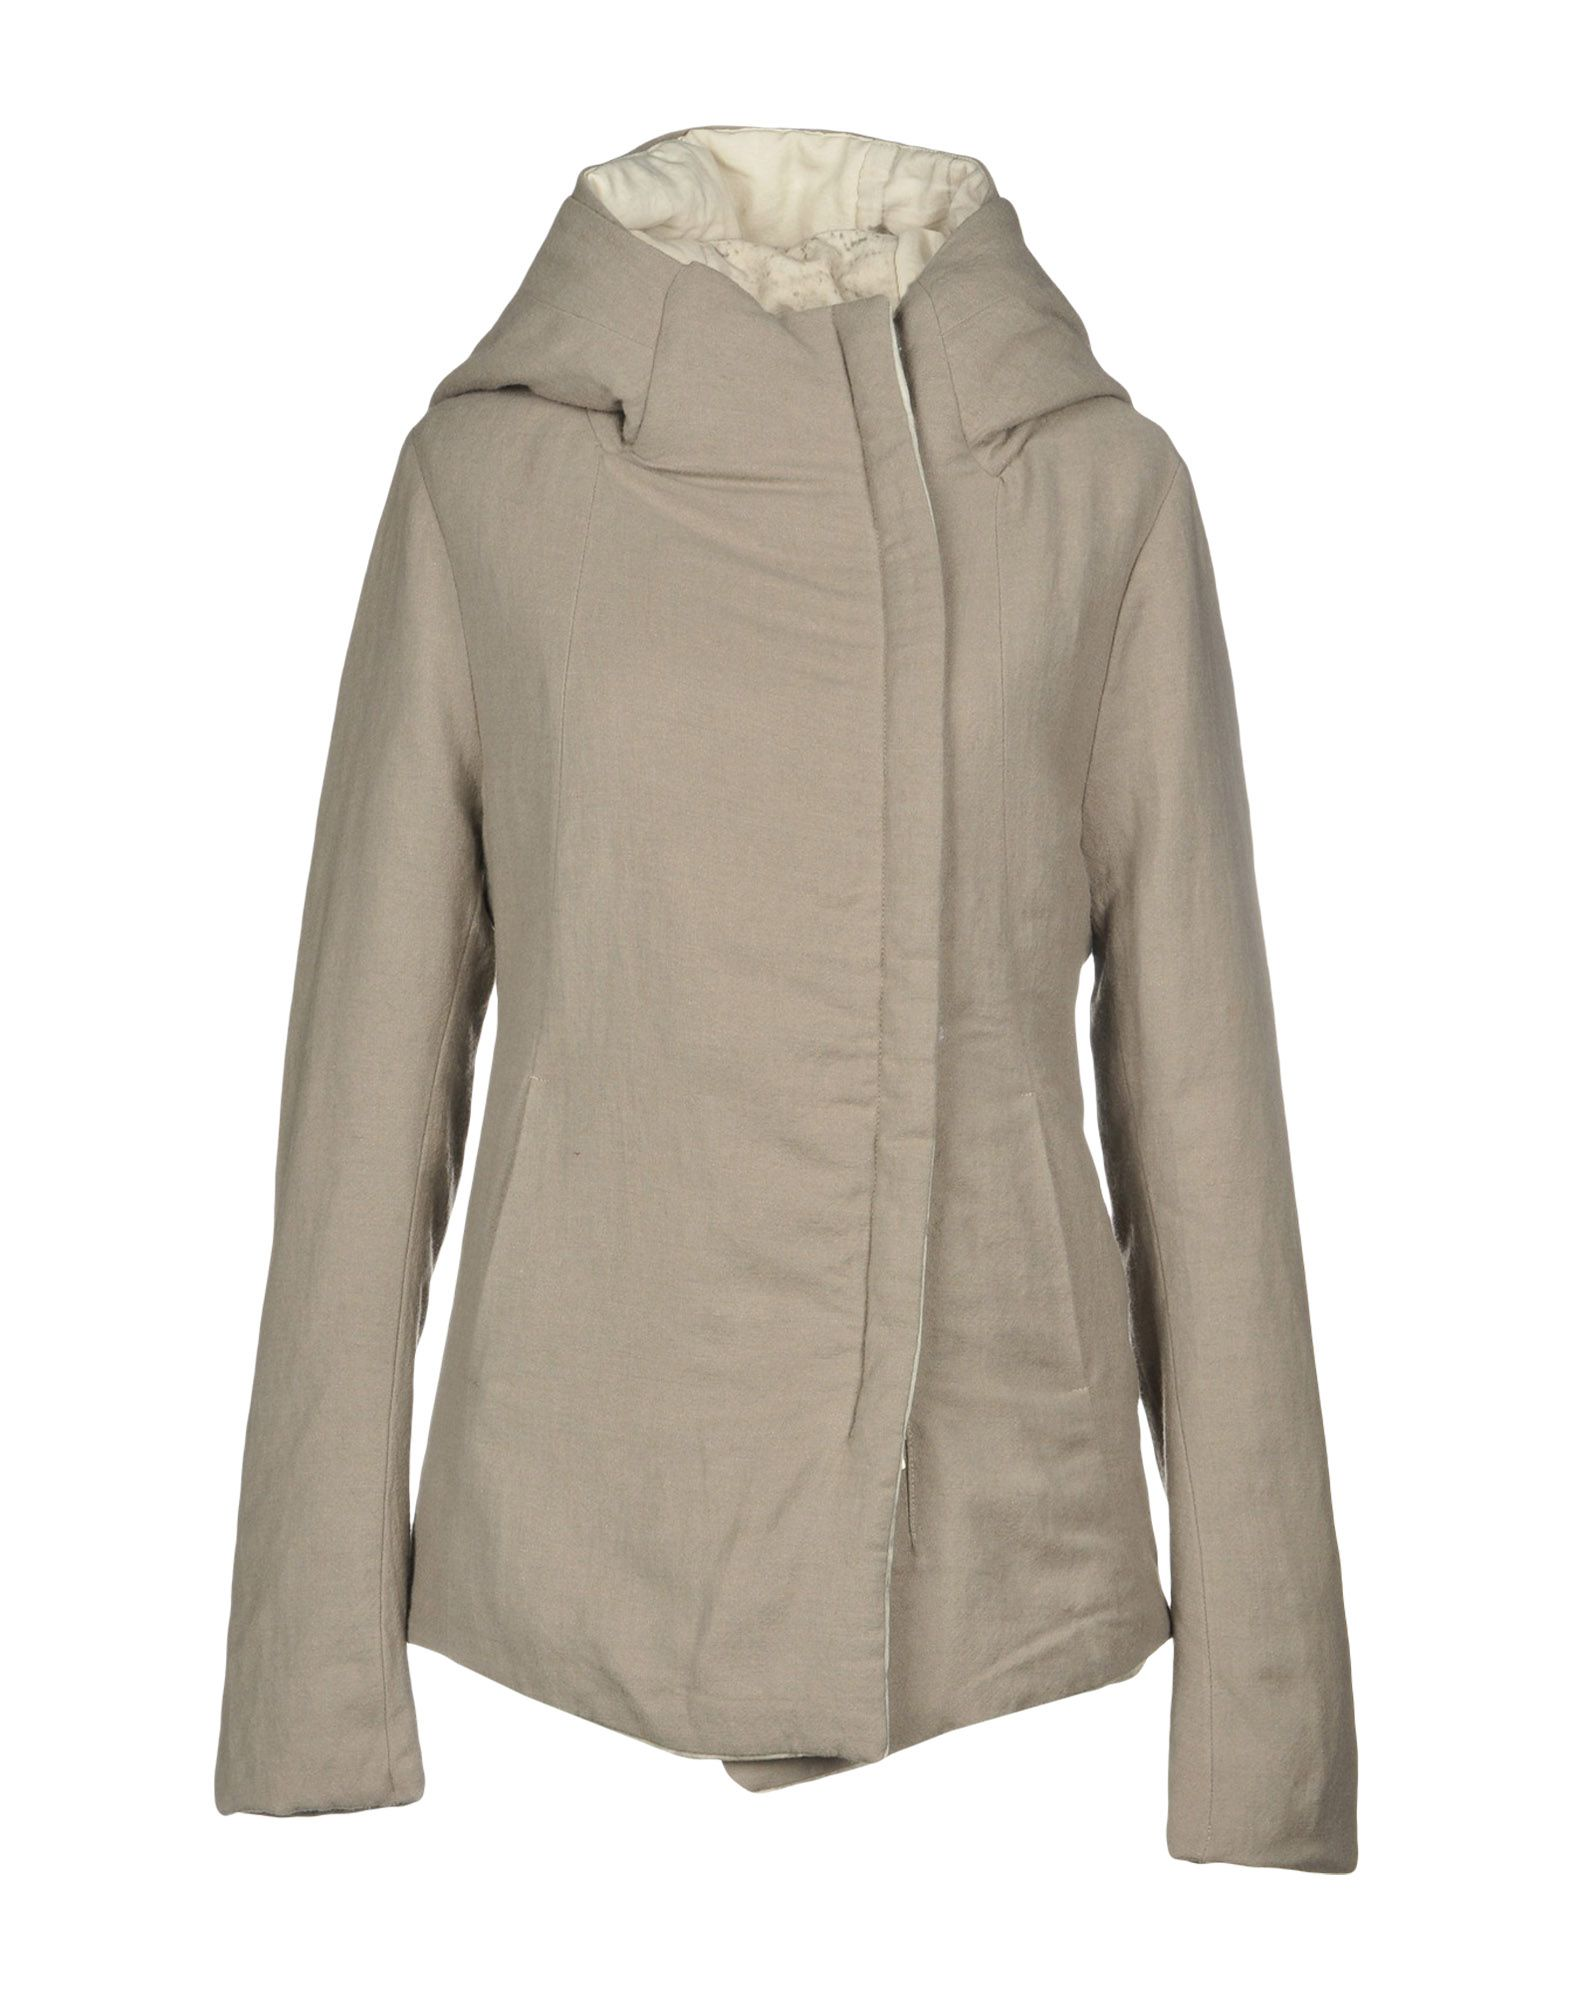 10SEI0OTTO Down Jacket in Grey